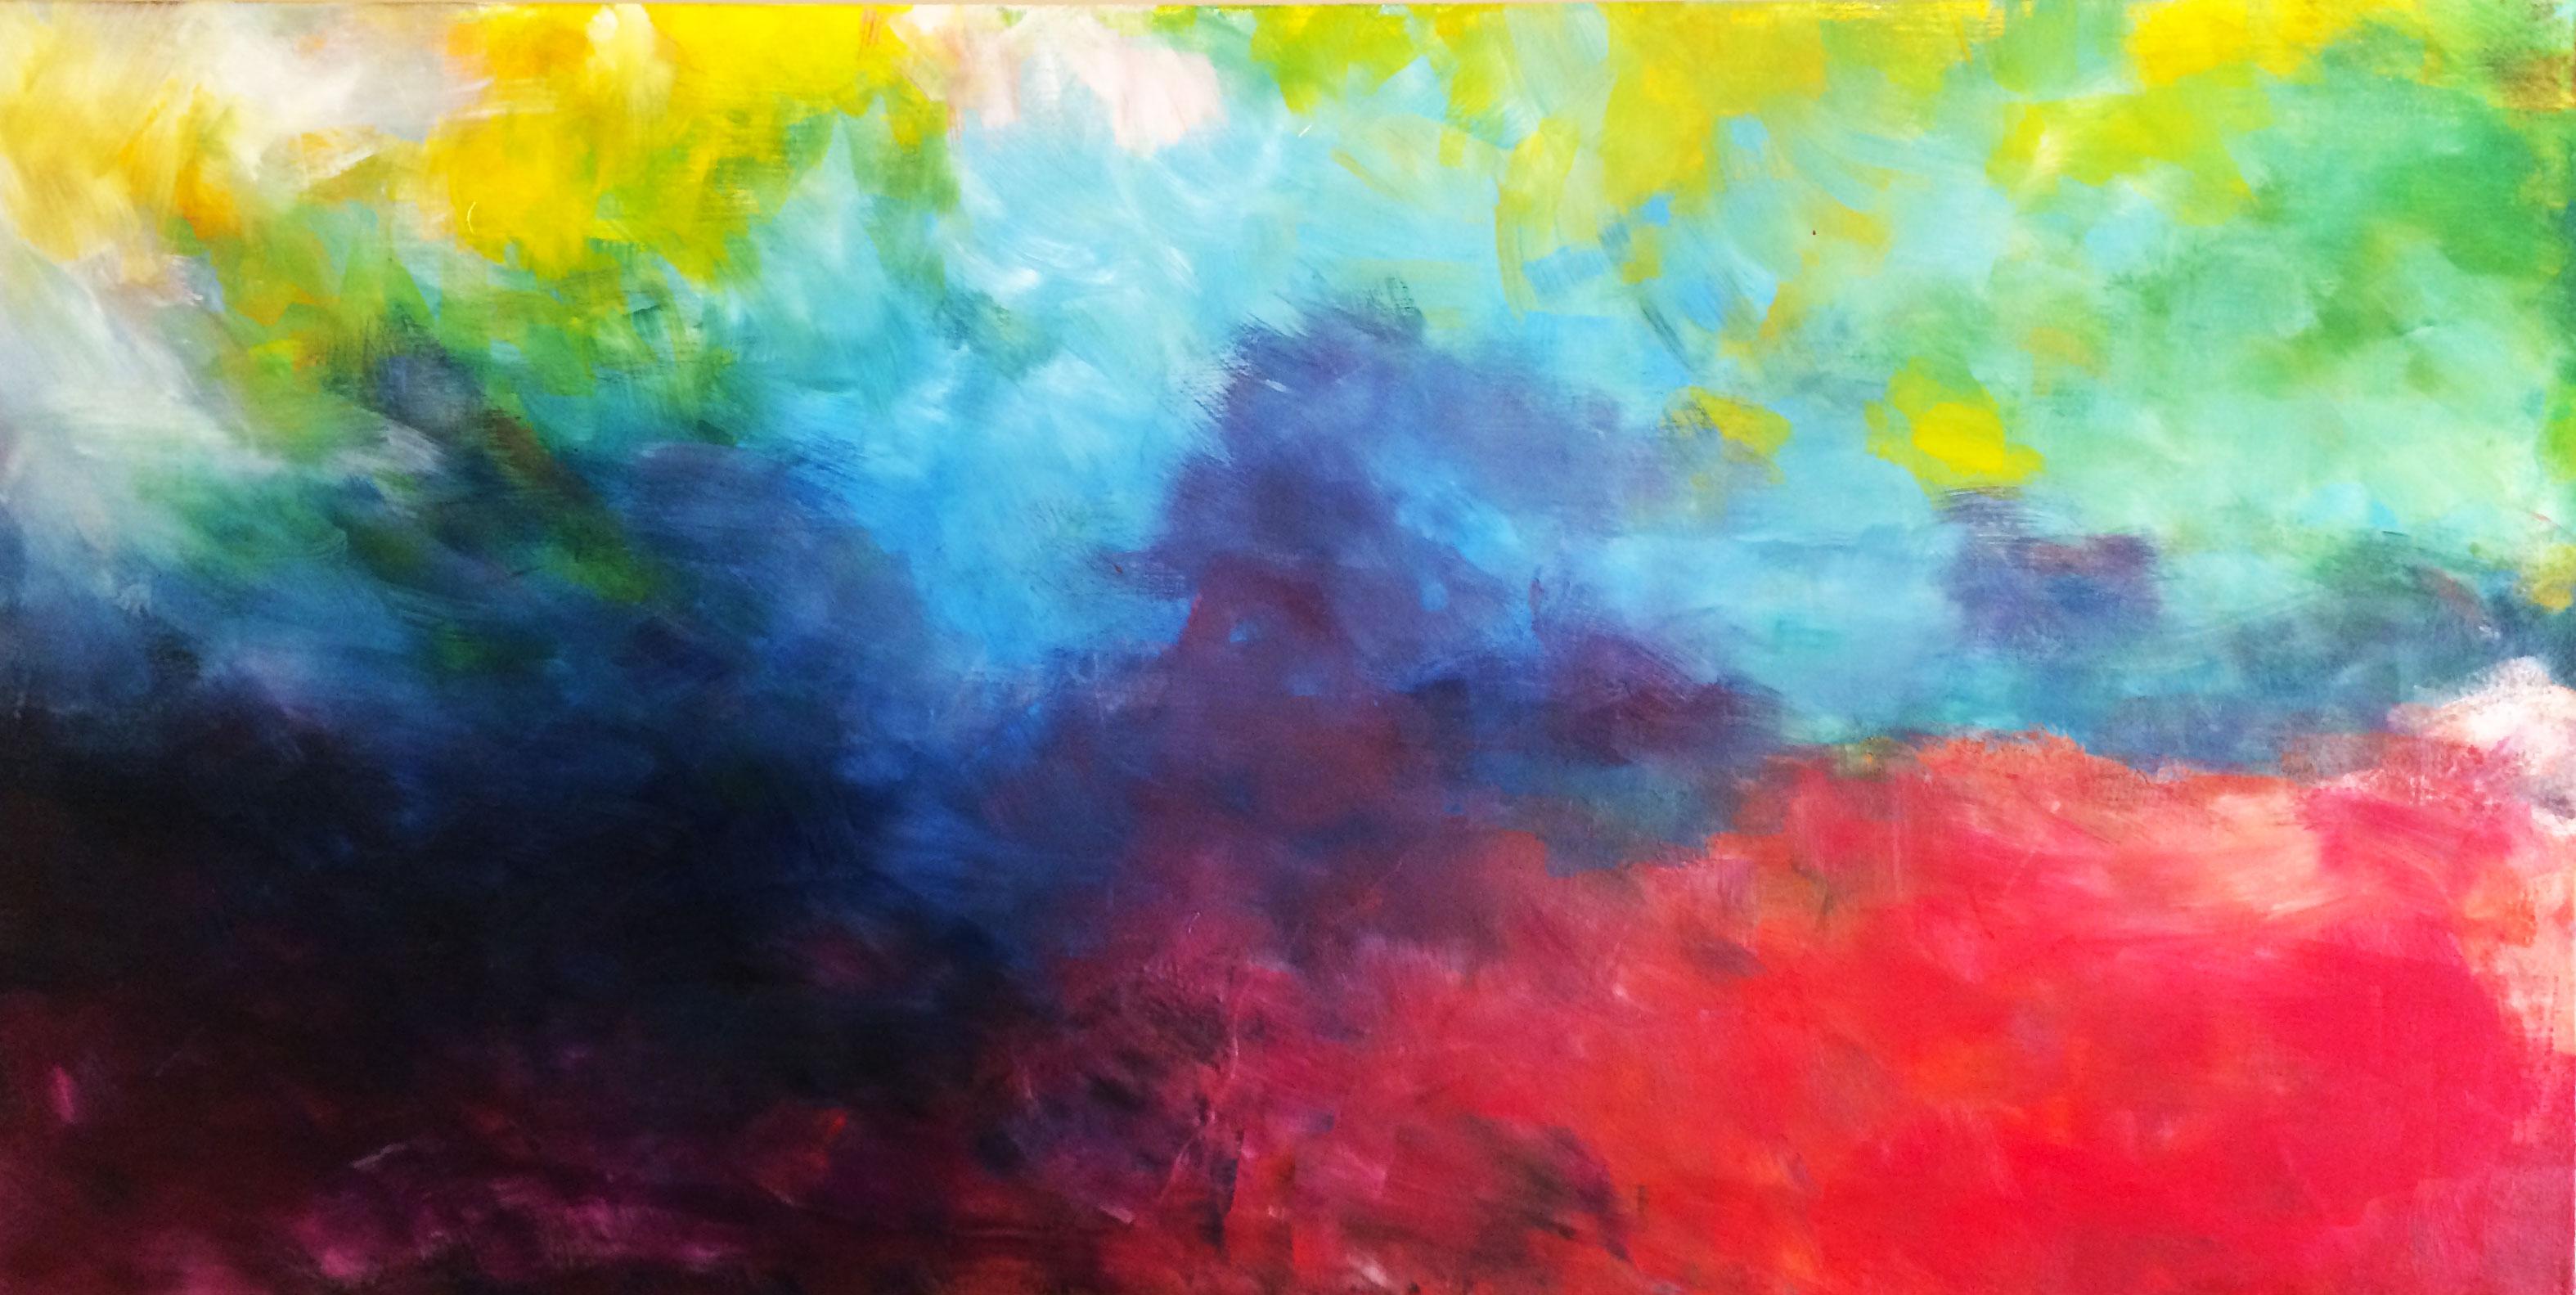 Abstract Art Background 8246   HDWPro 3149x1583